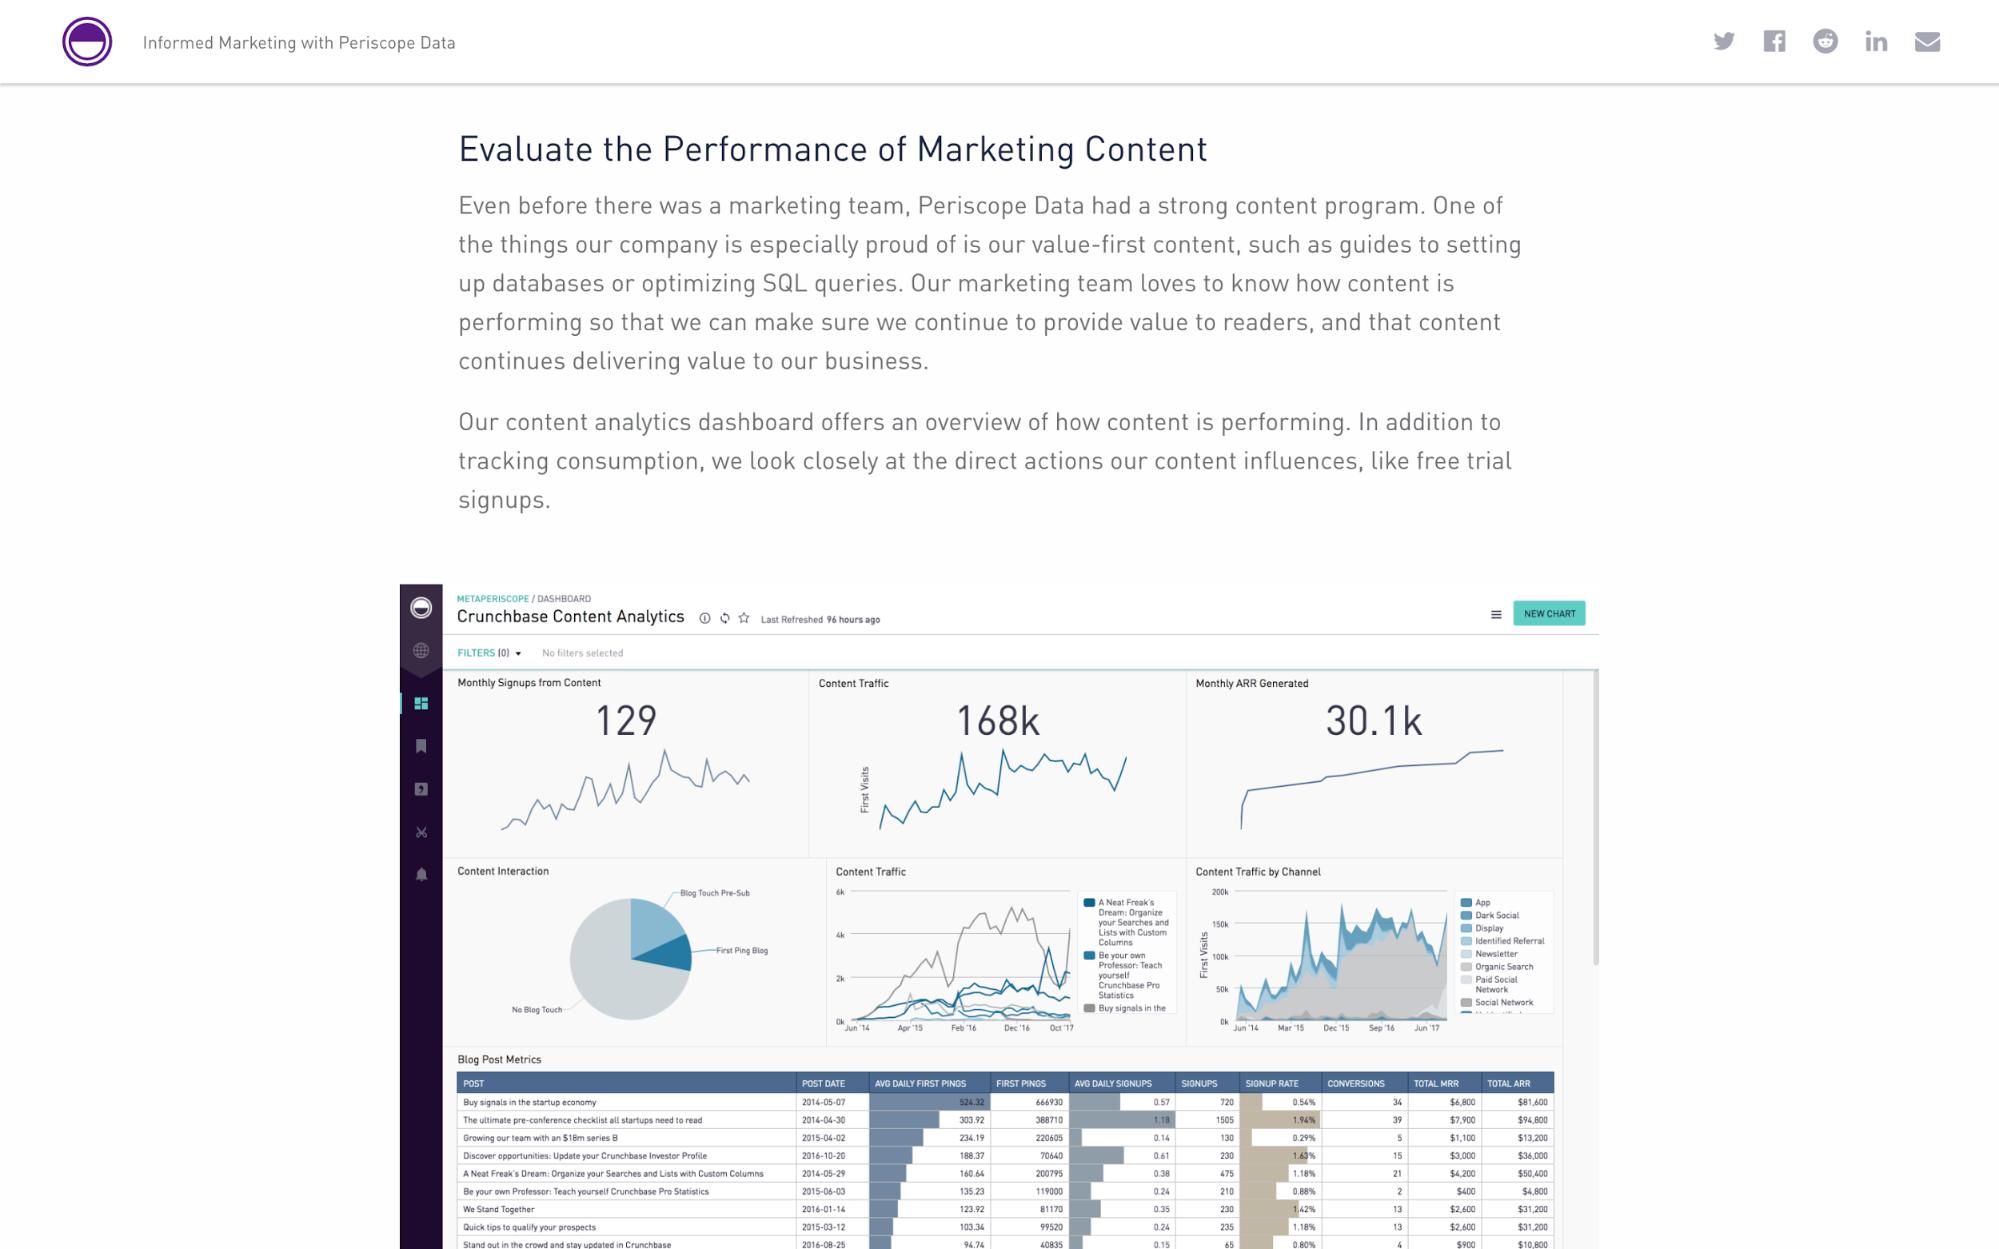 Periscope Data's blog